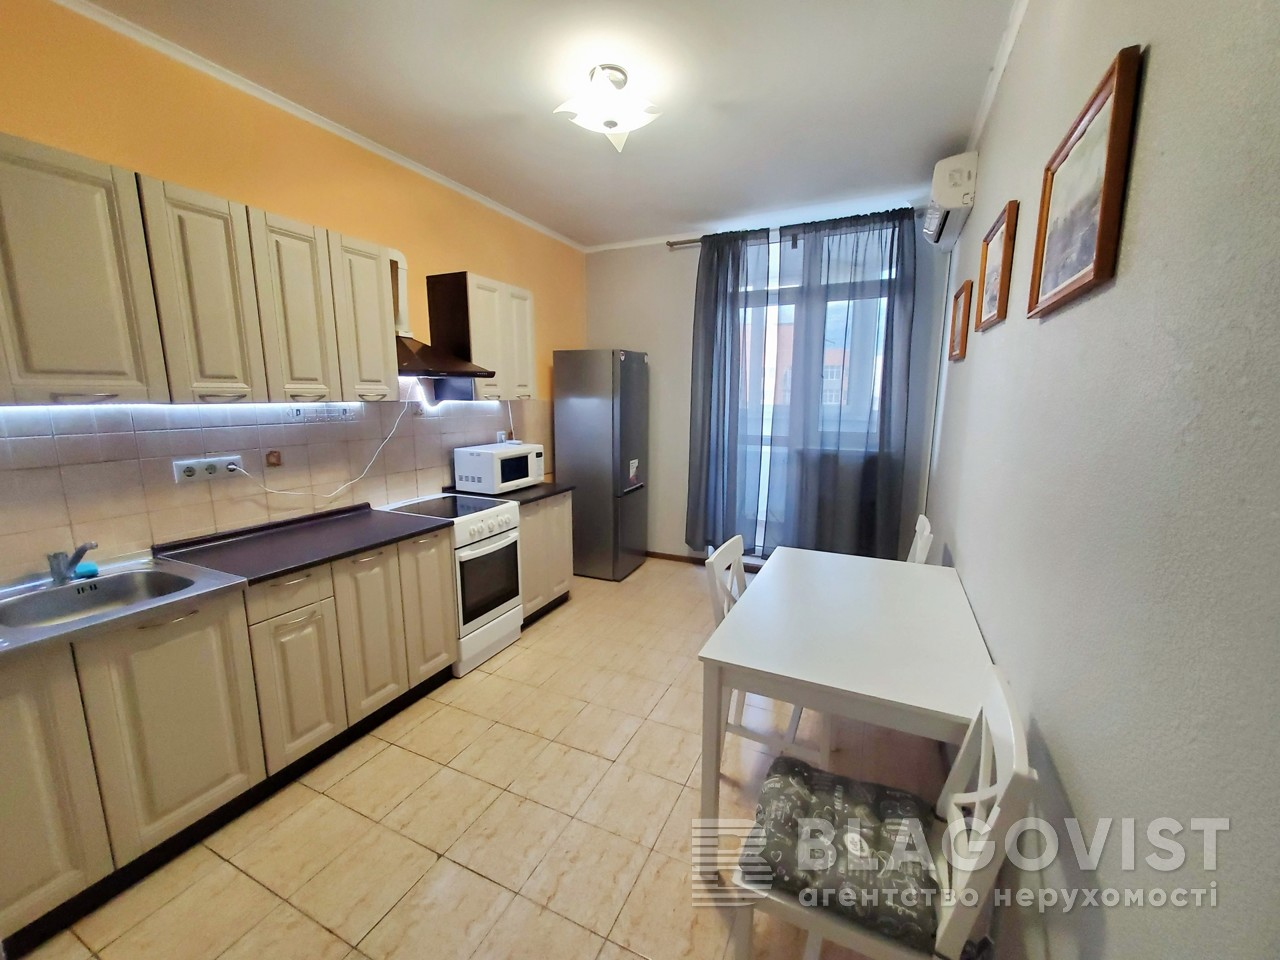 Квартира E-41053, Семьи Кульженко (Дегтяренко Петра), 33, Киев - Фото 12